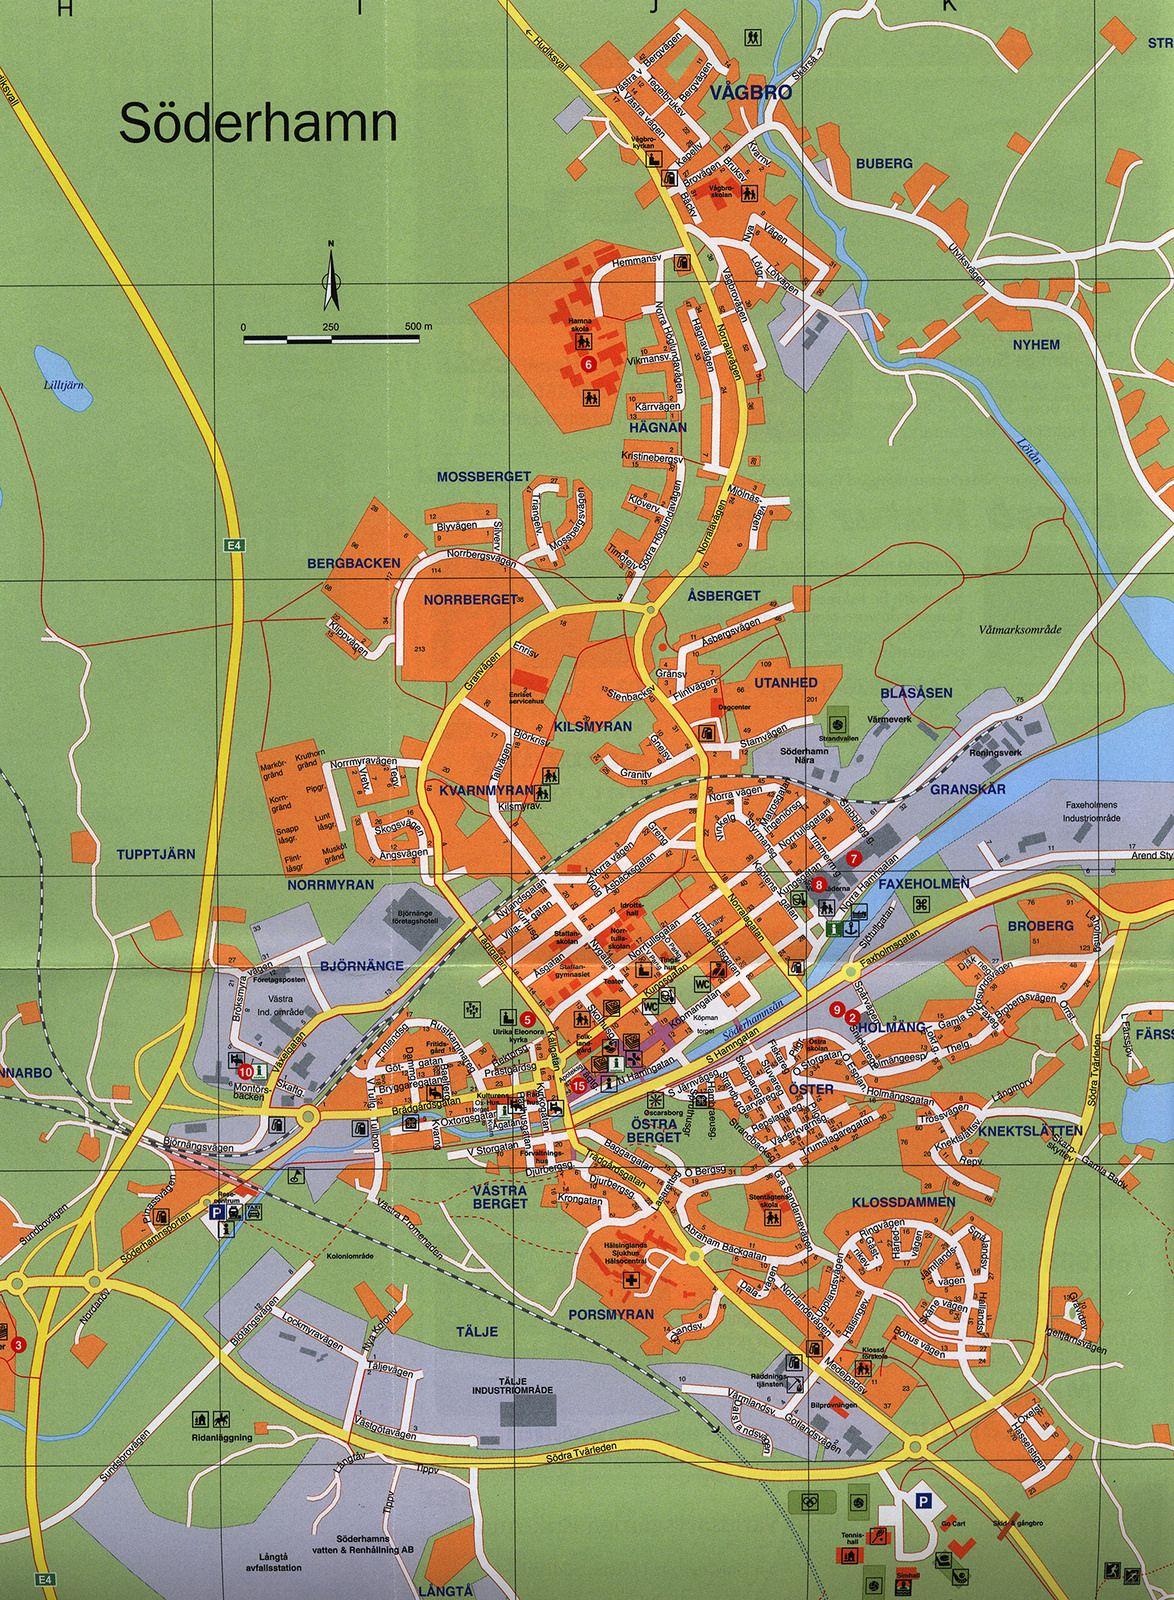 marma karta Söderhamn Karta Map Karte 2015_2; Gavleborg, Sweden marma karta